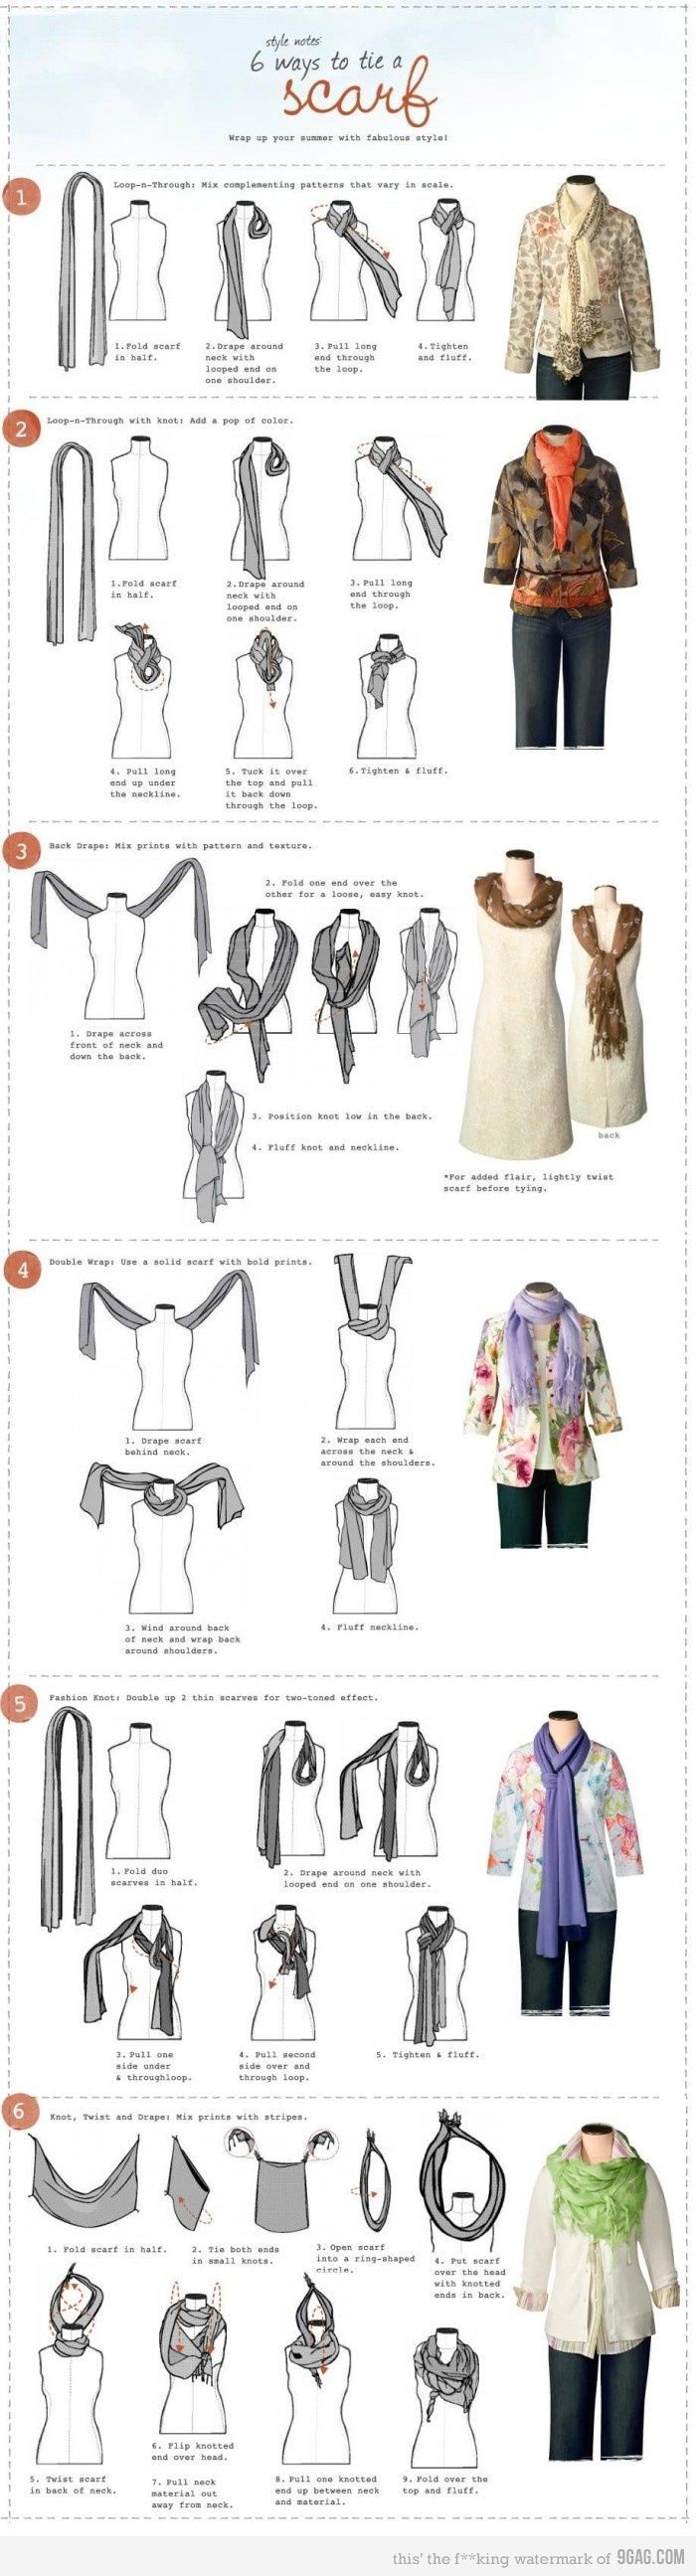 Ways to Tie a Scarf. love it, love scarves